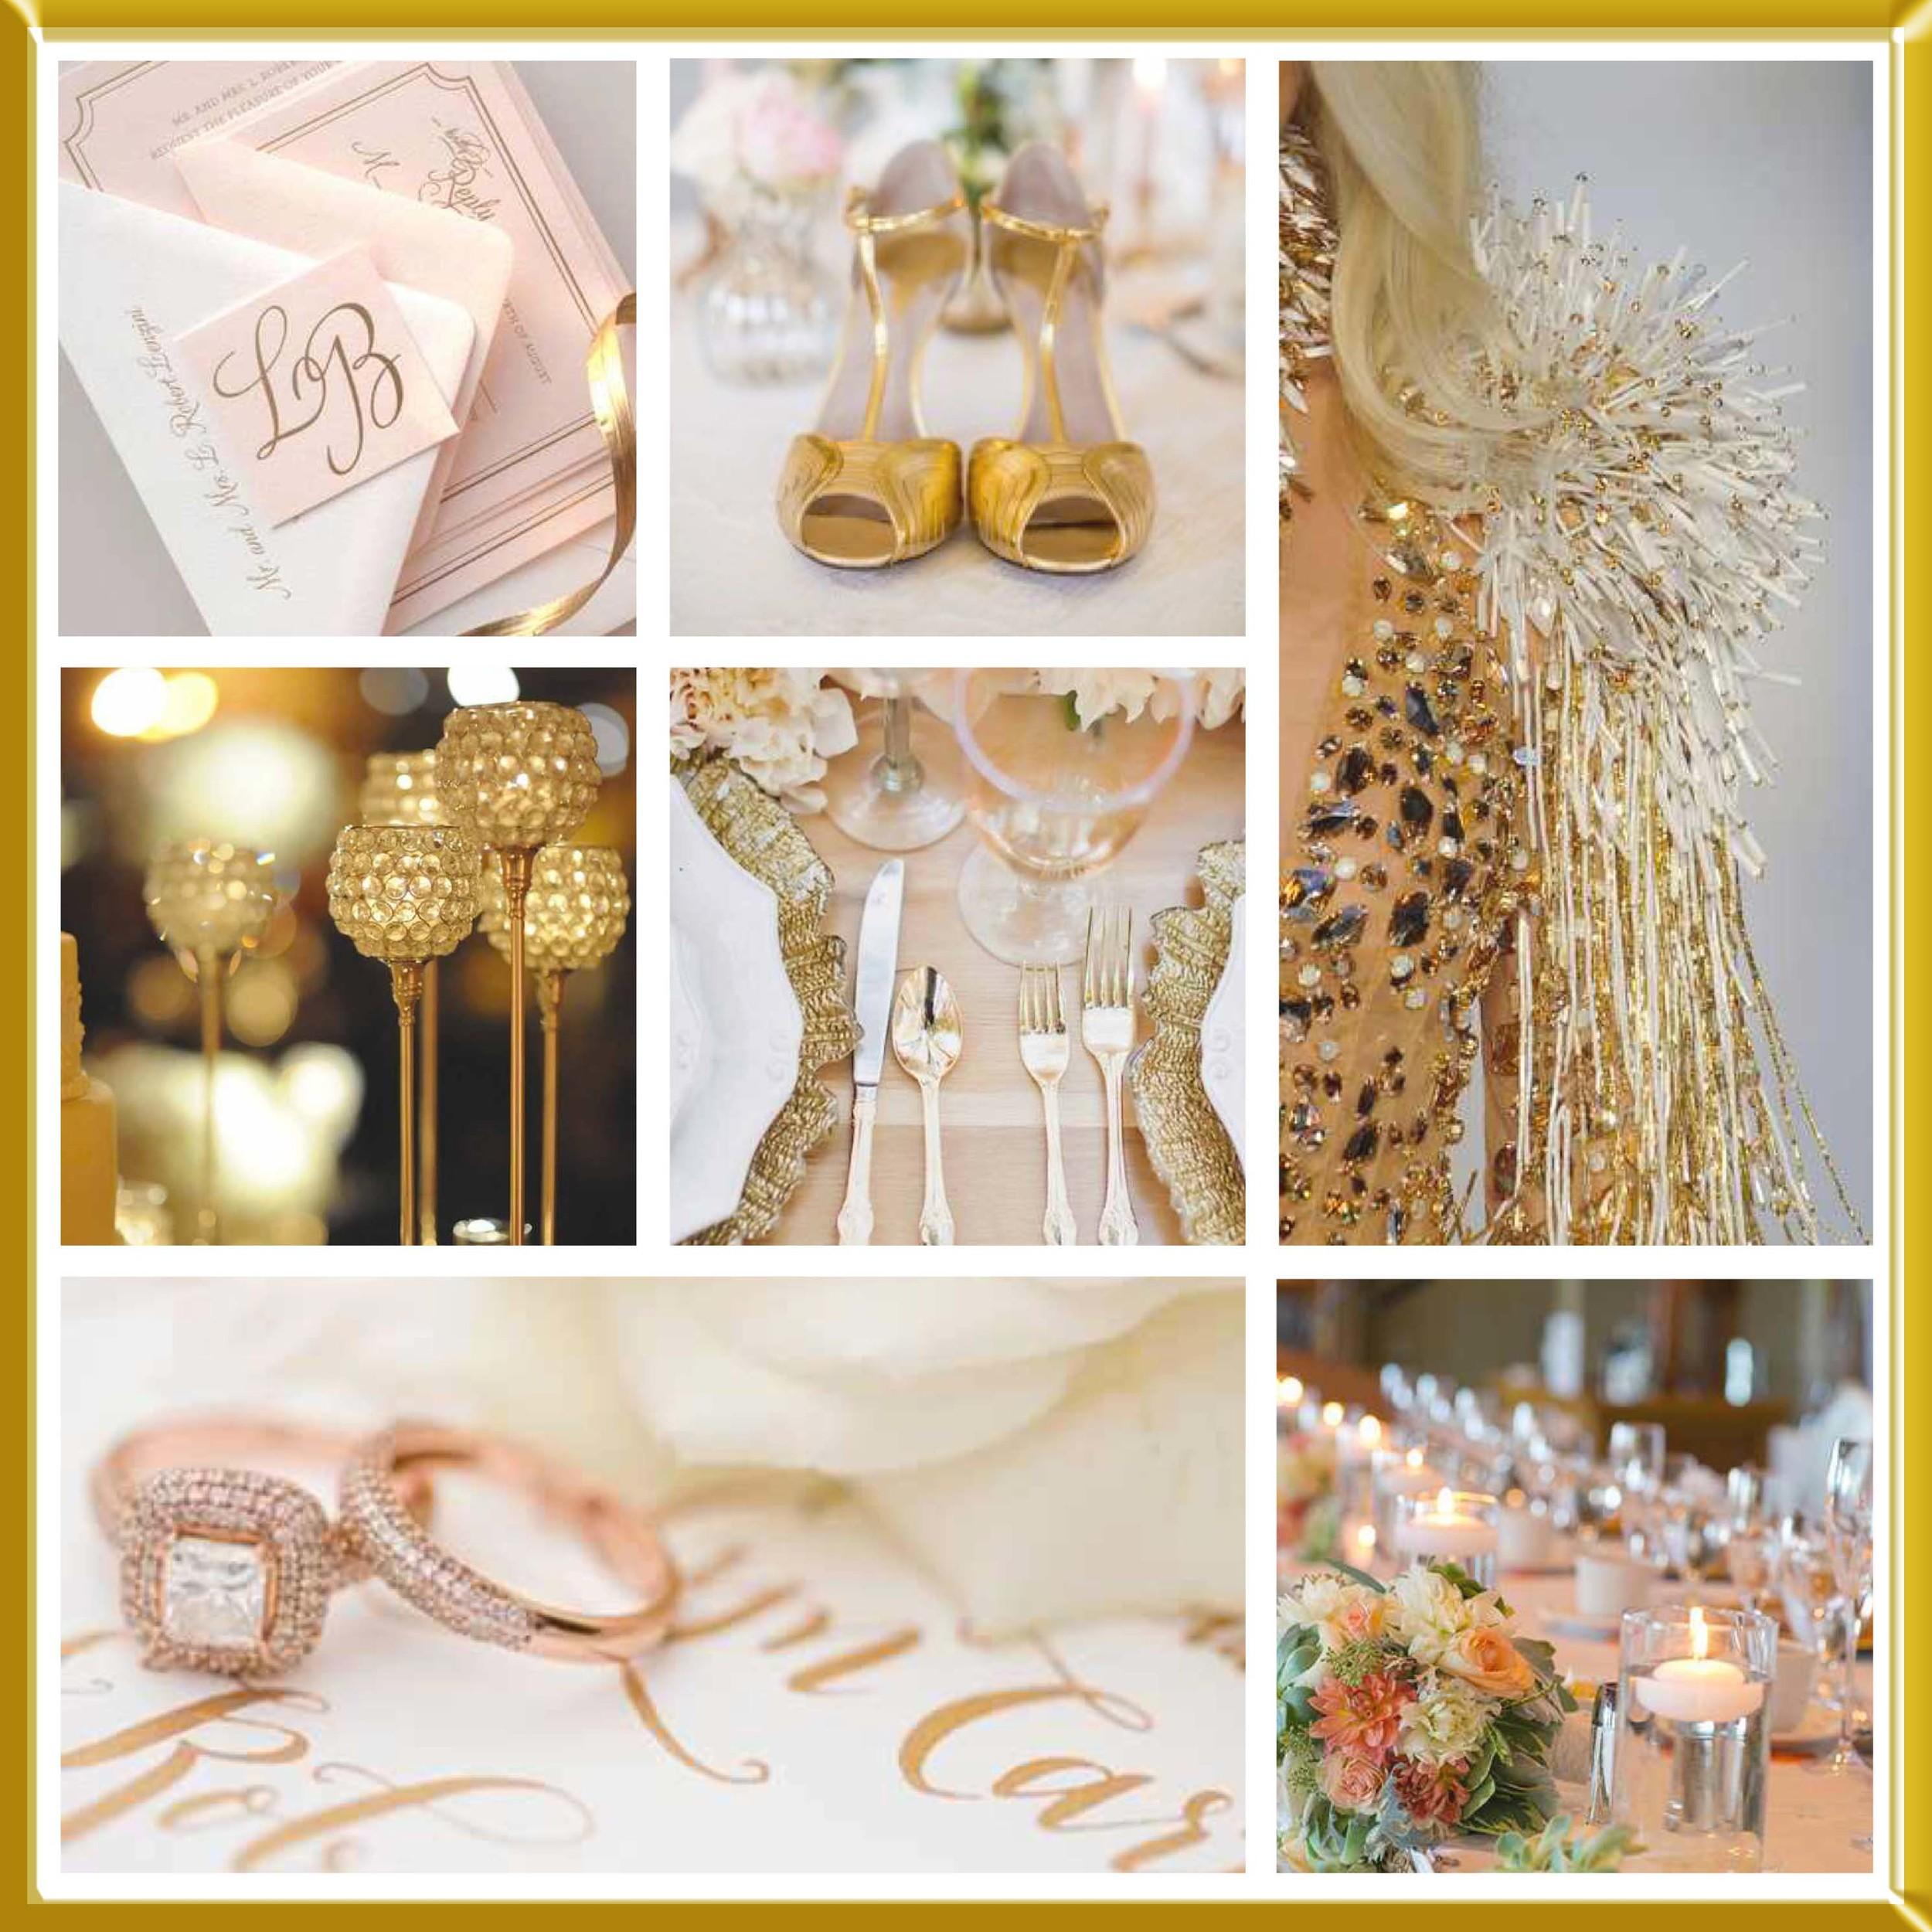 Rose Gold wedding inspirational board